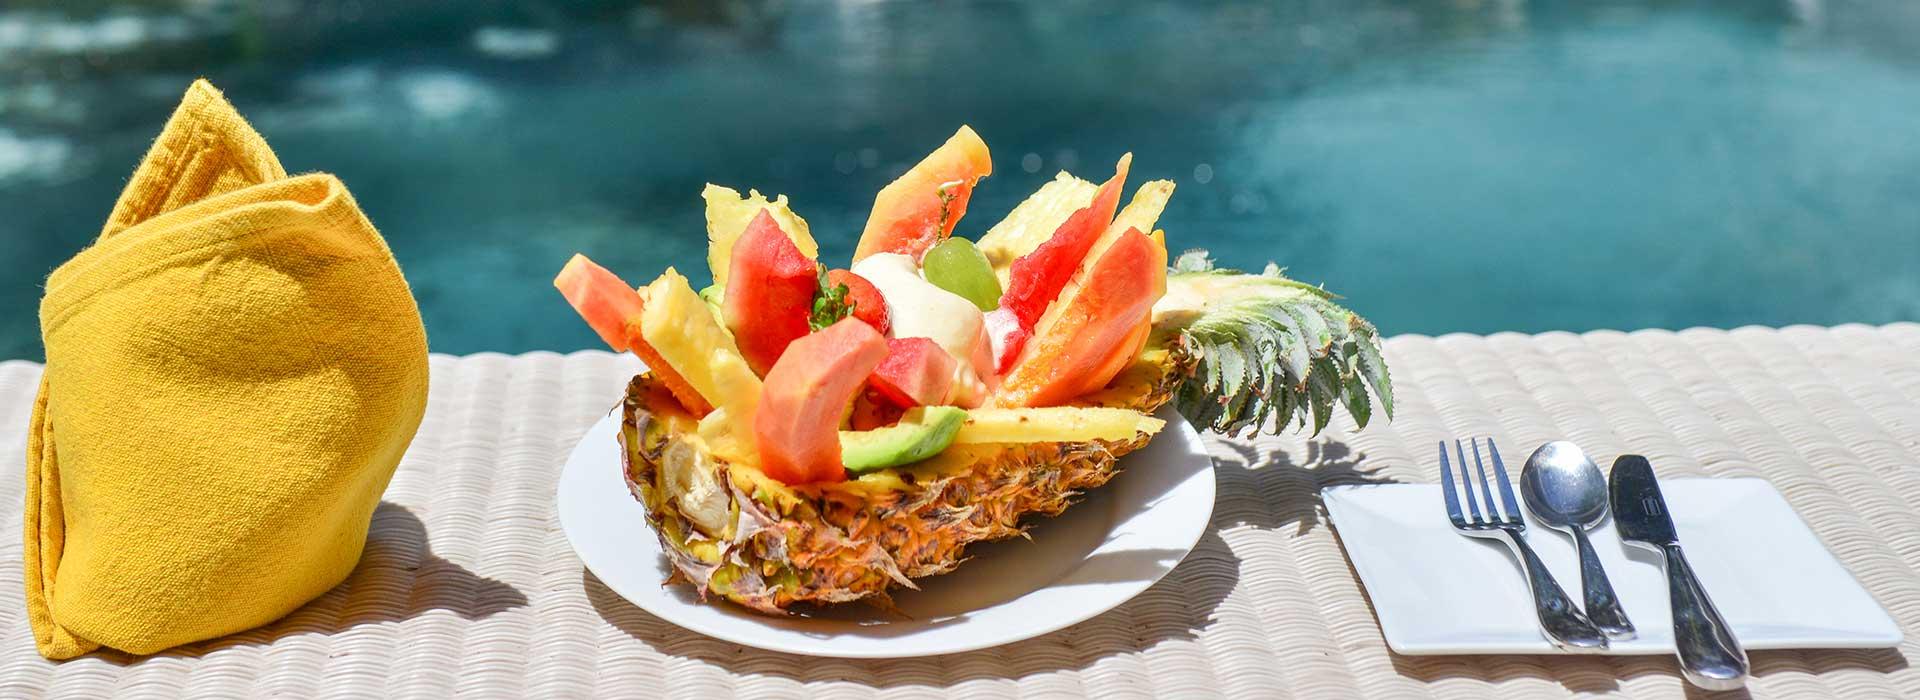 Enjoy Healthy & Delicious Breakfast 32 Middle Street Galle